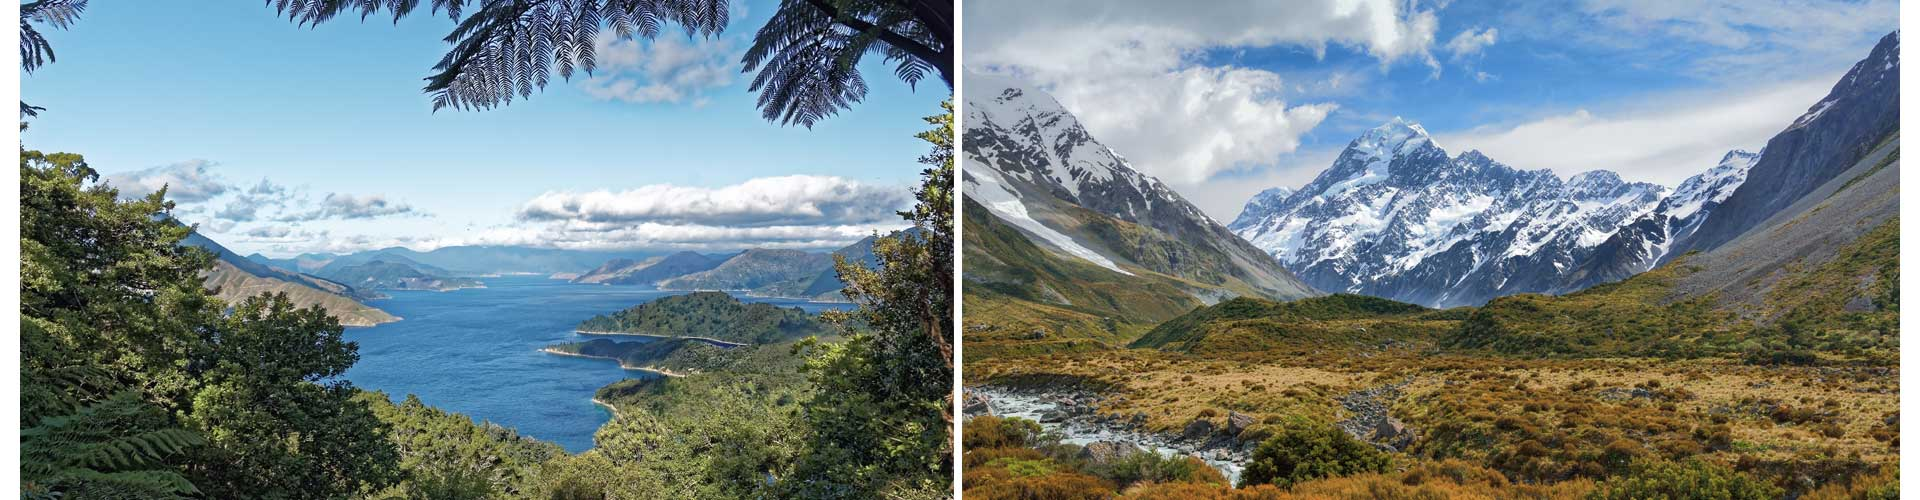 Neuseeland Reisetagebuch Ozeanien Maori Aoraki Strand Bucht